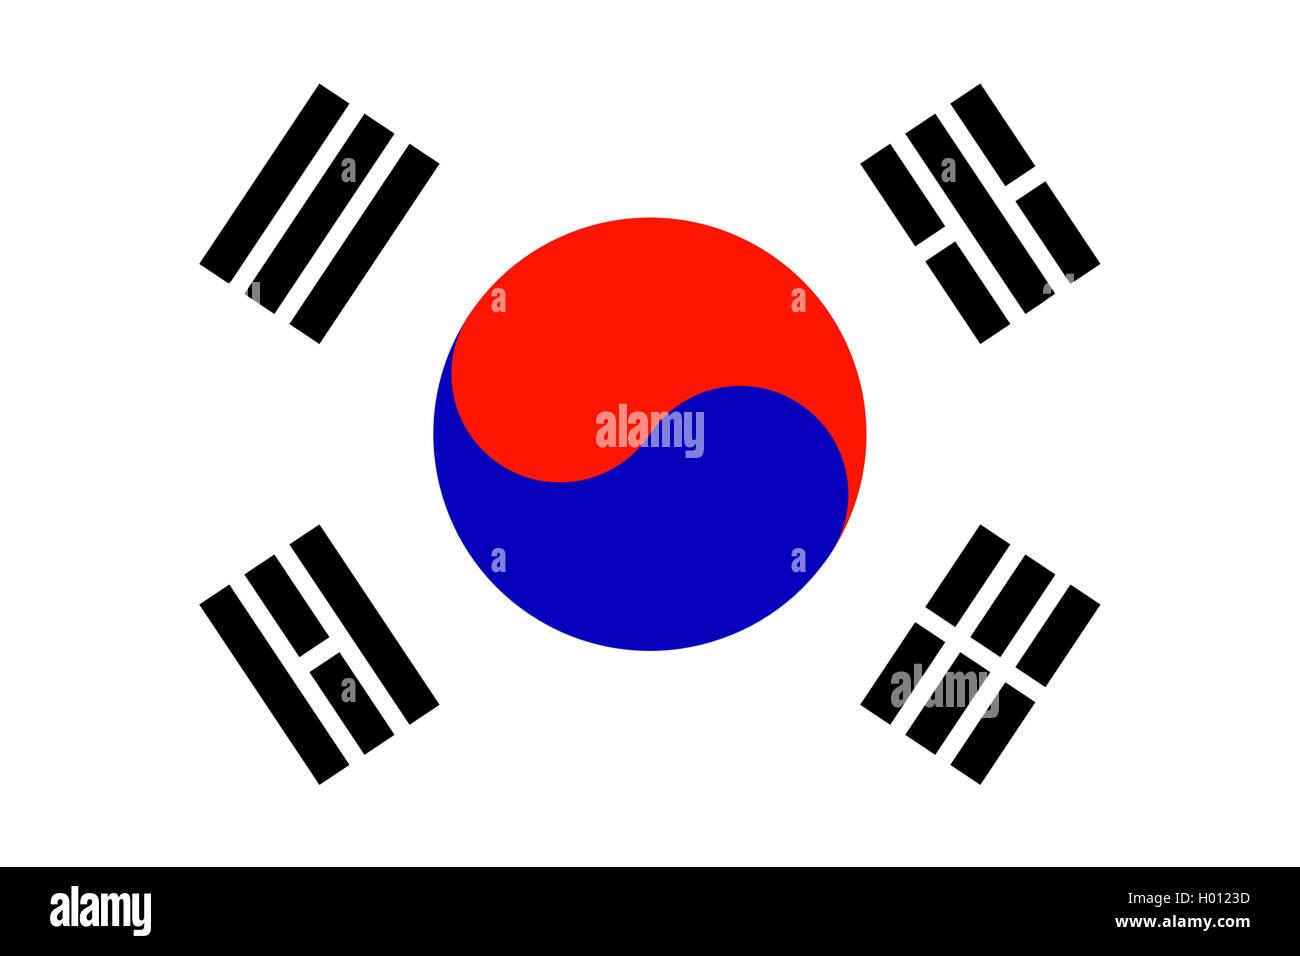 Flagge Suedkoreas, Taegeukgi, Suedkorea | flag of South Korea, Taegukgi, South Korea | BLWS419761.jpg [ (c) blickwinkel/McPHOTO/ - Stock Image